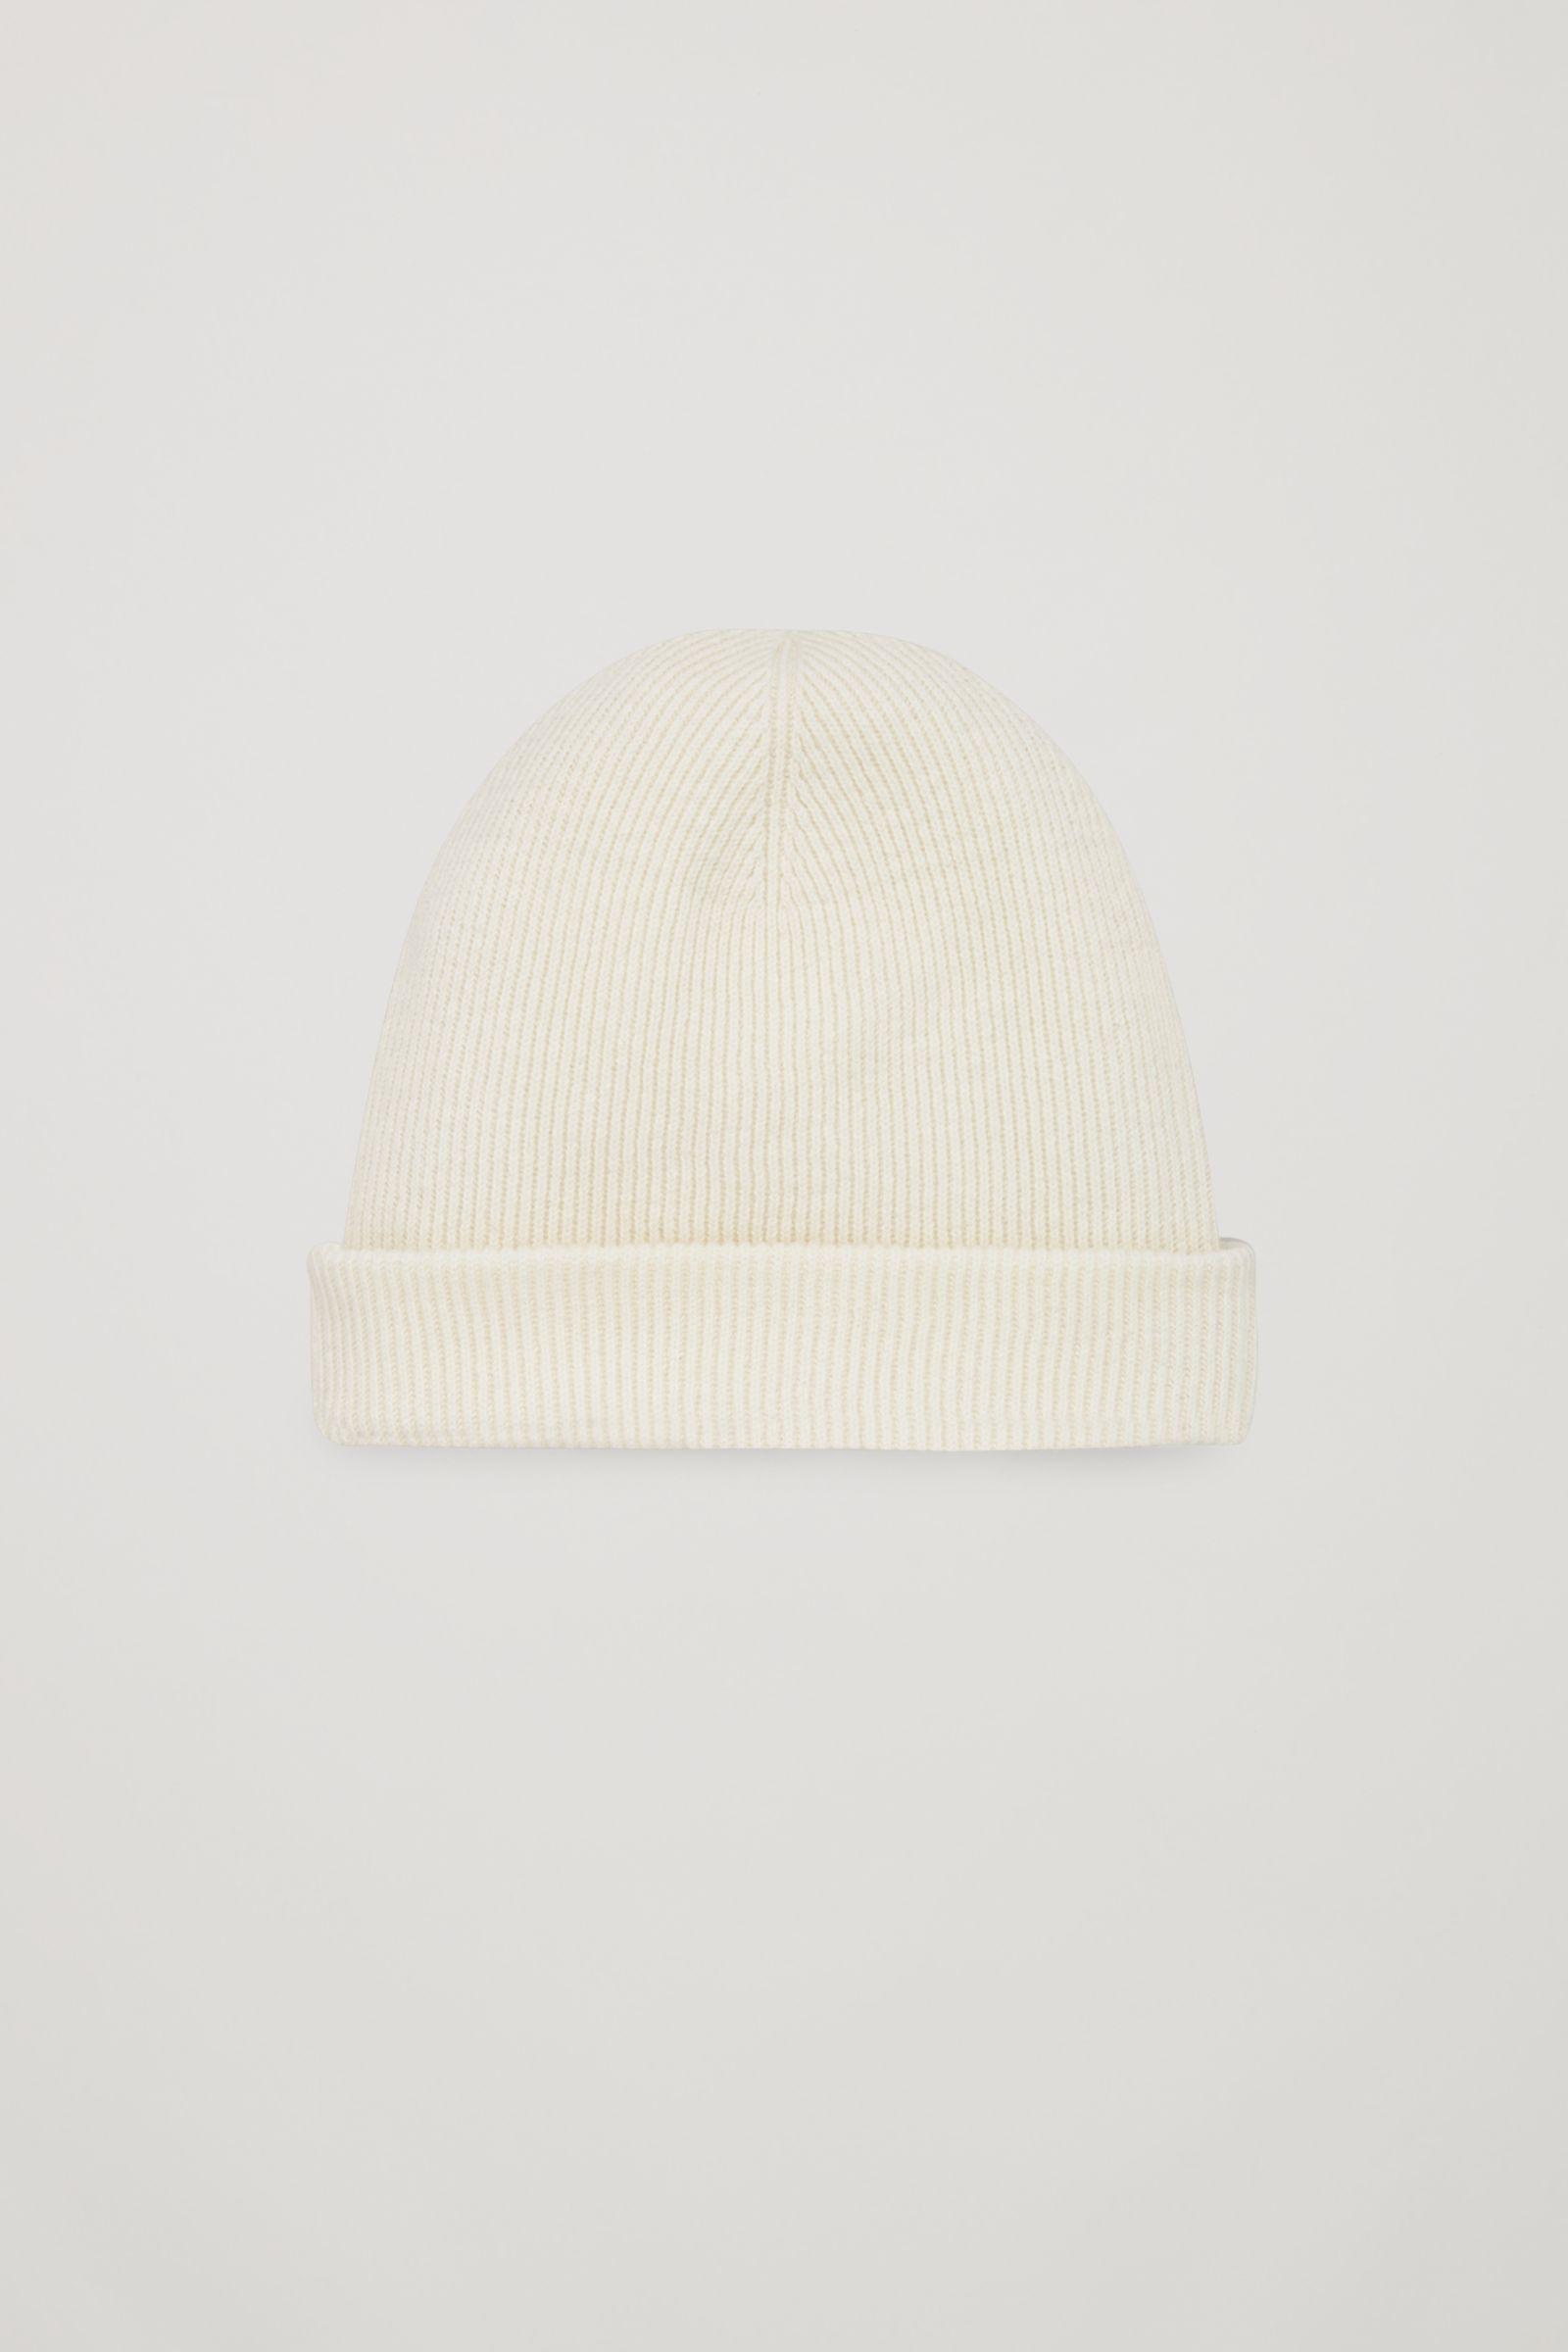 COS Wool-blend Skull Hat in Natural for Men - Lyst 68766dc5fe7c